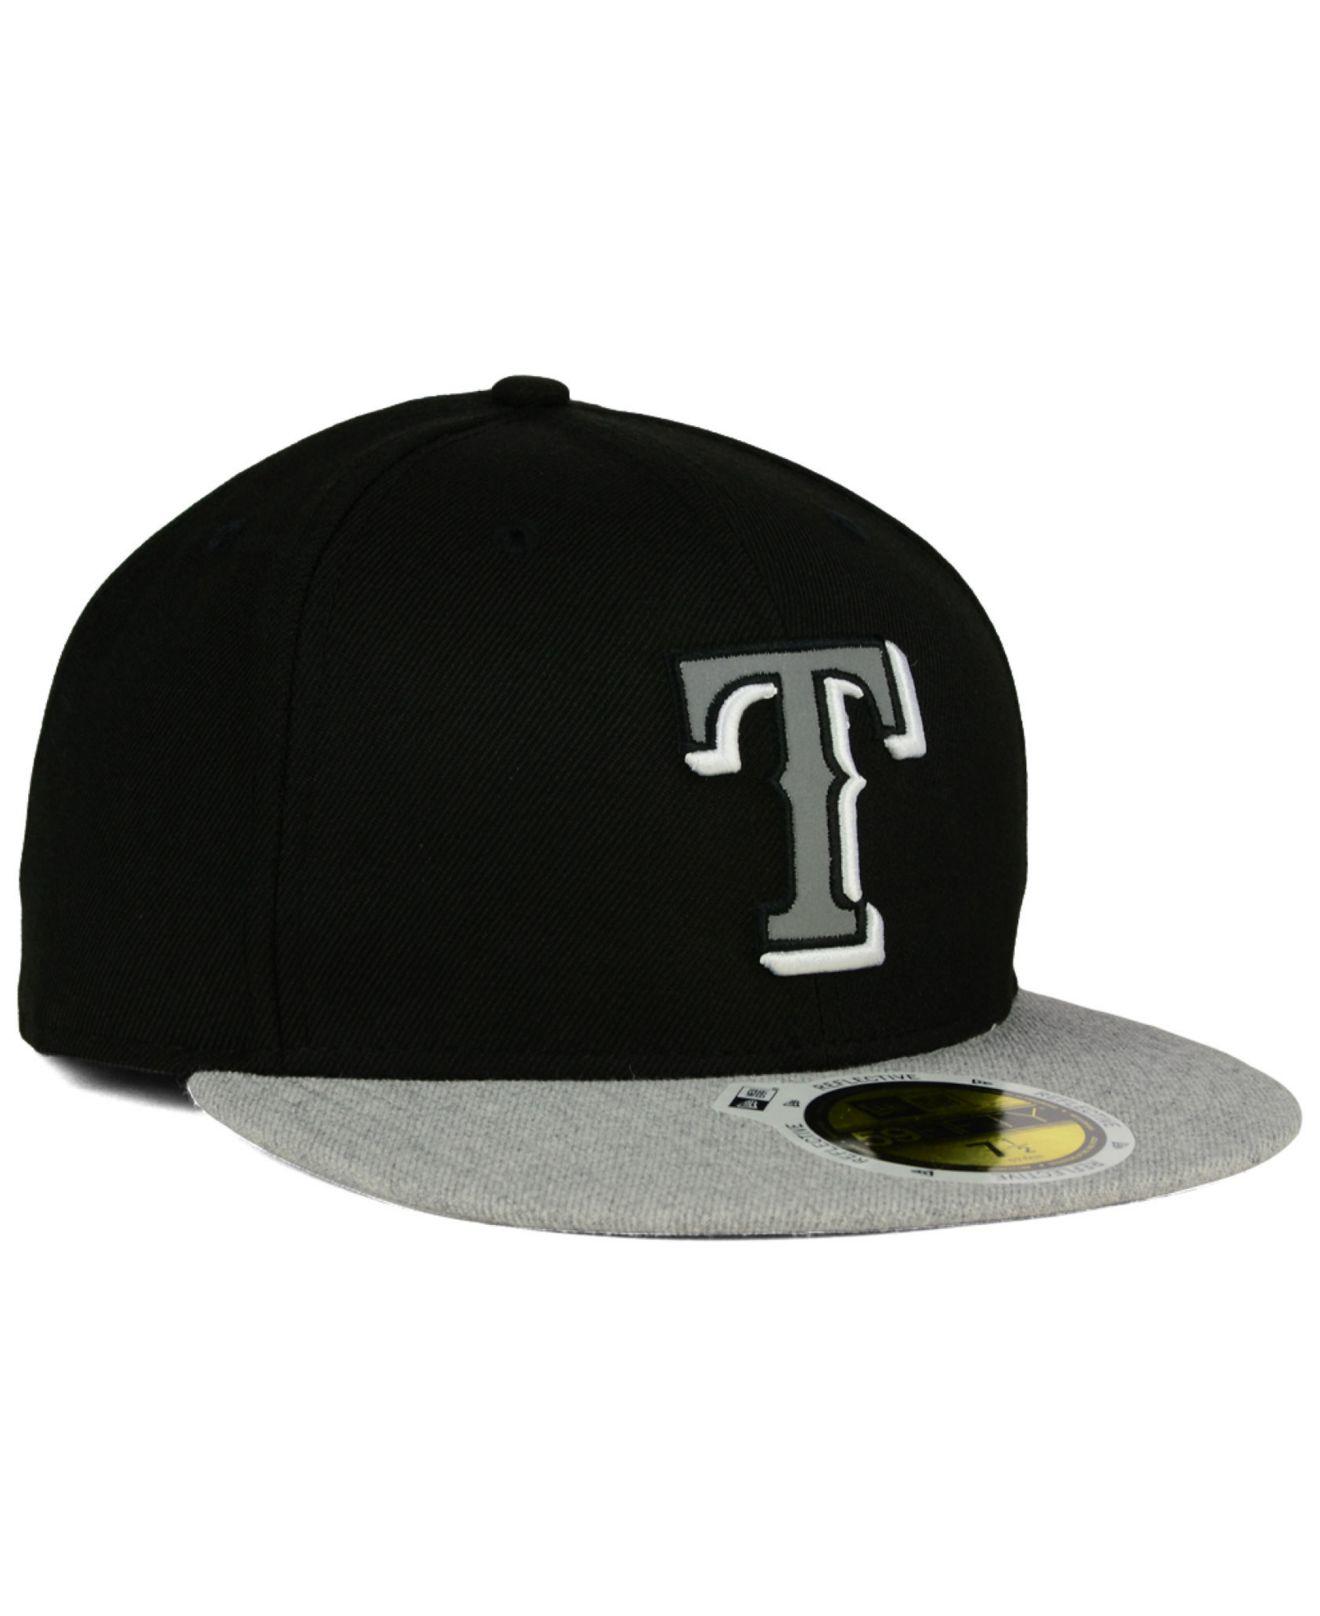 separation shoes 7b6a6 60632 ebay lyst ktz texas rangers night reflective 59fifty cap in black for men  7d56e 98fff